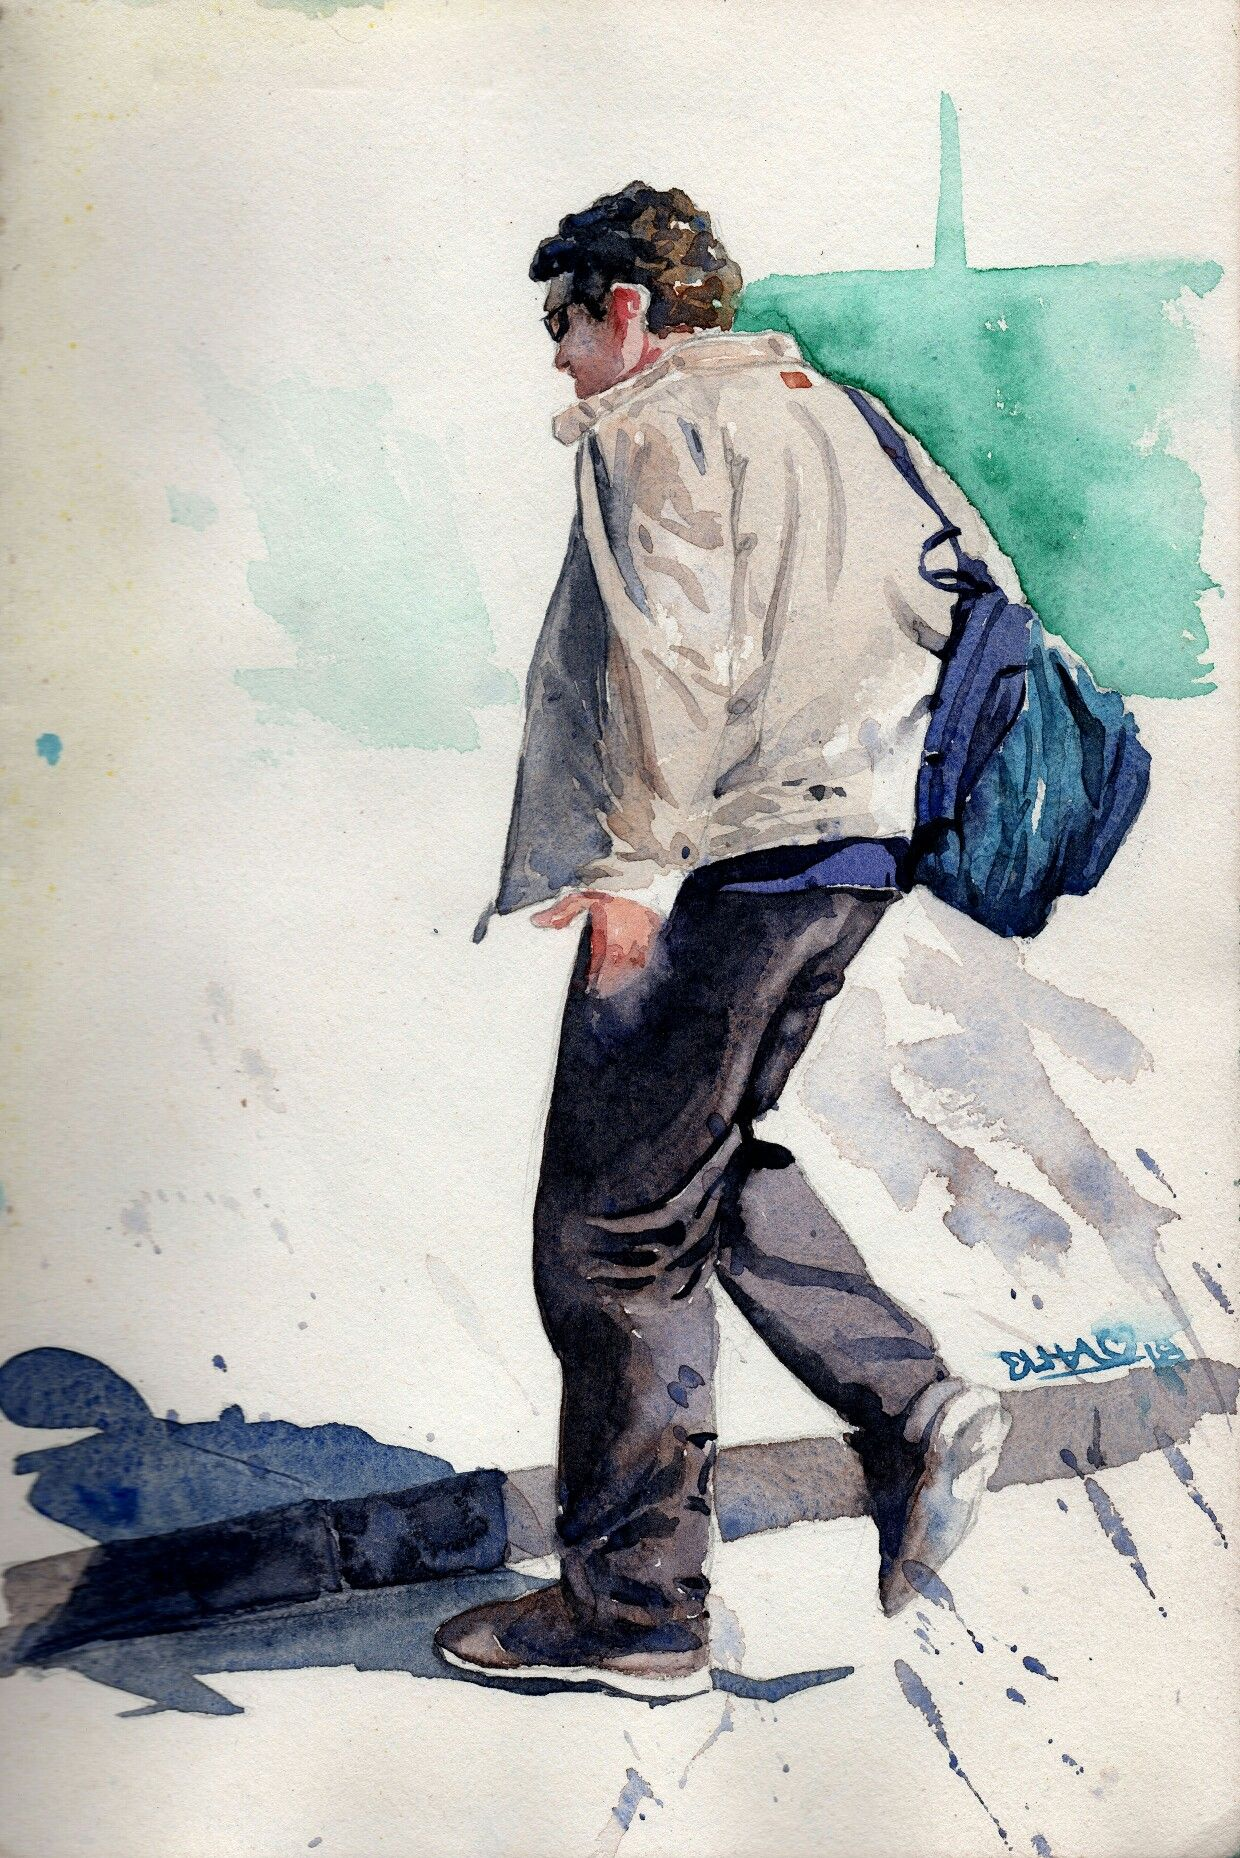 Watercolor Painting By Rajkumar Sthabathy 25 Watercolor